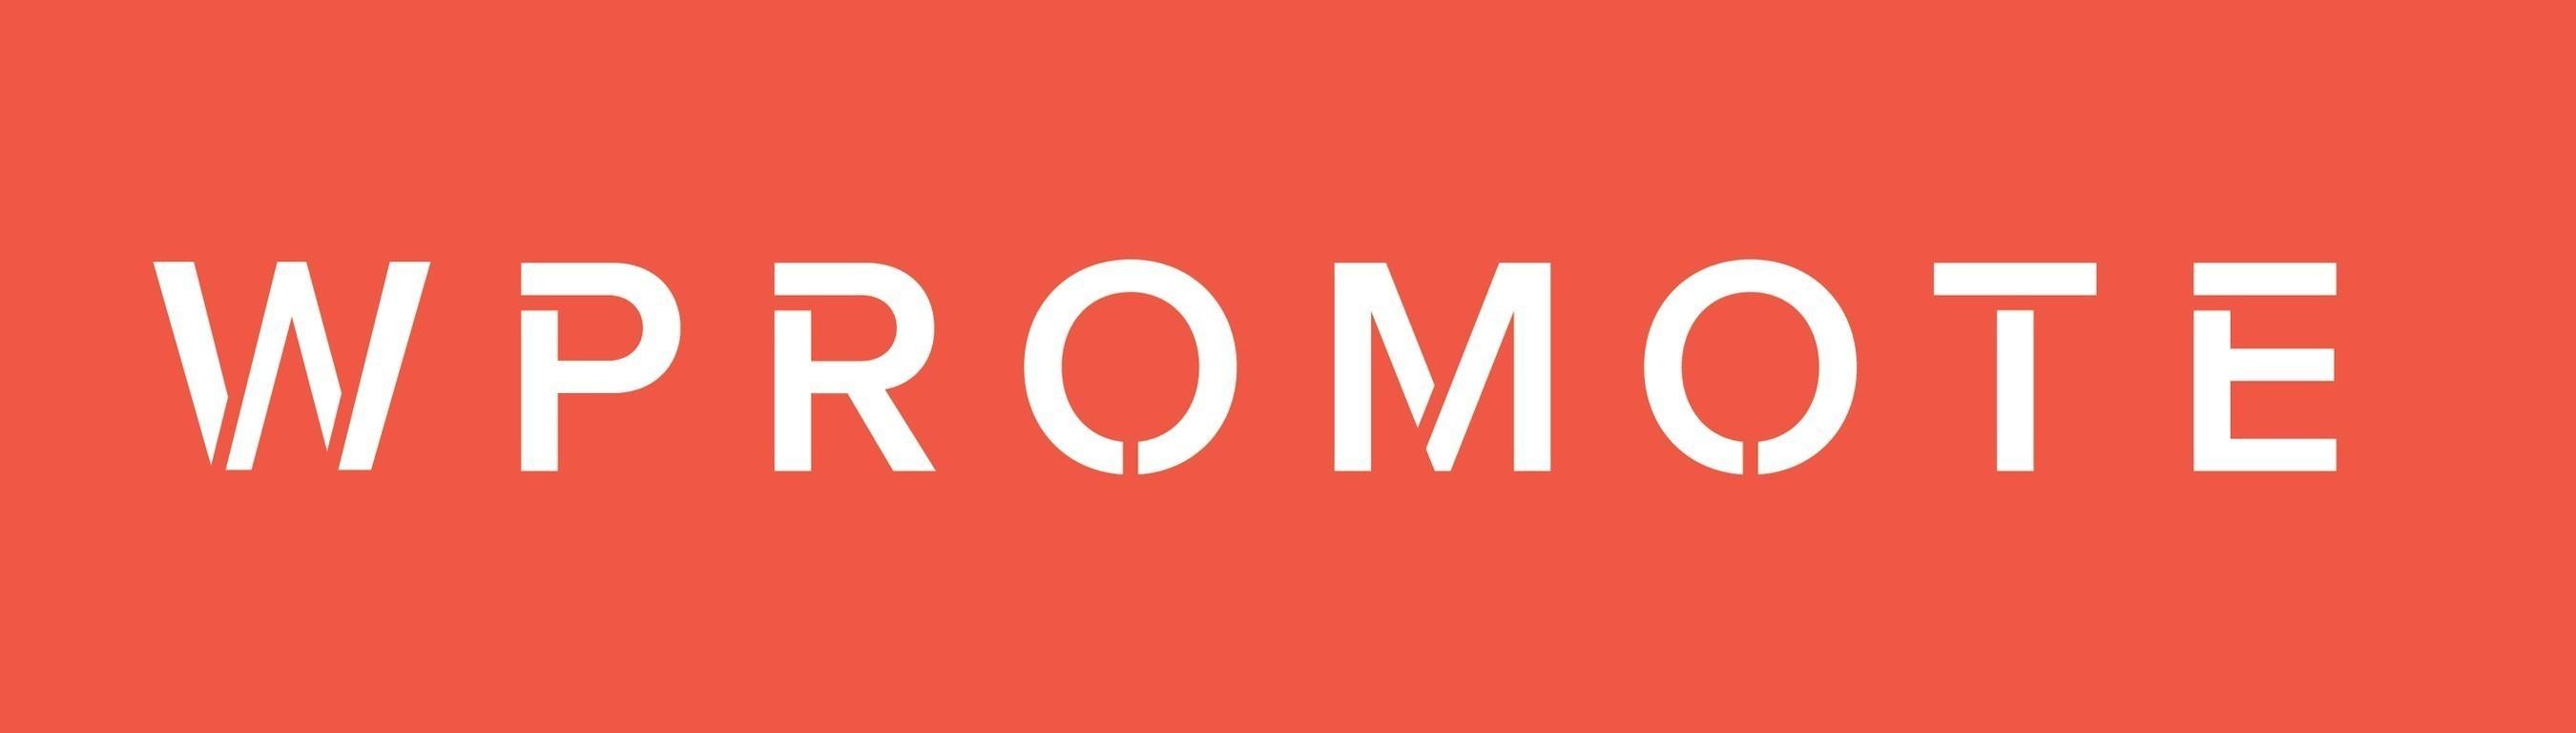 Wpromote Launches National Digital Marketing Scholarship